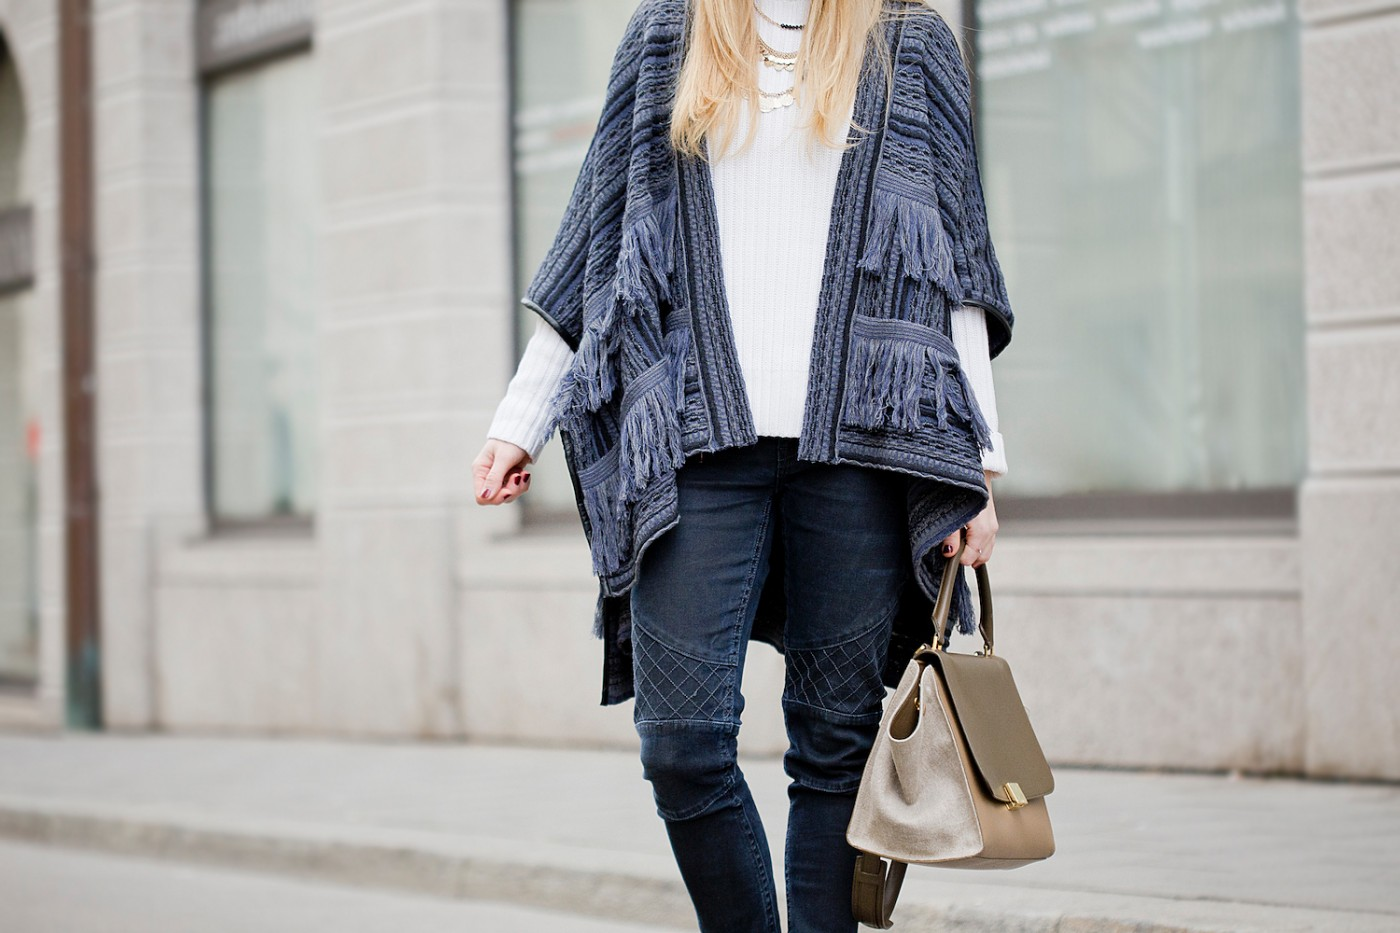 fringe poncho manila grace, donna piu scarpe shoes, beanie, winter look with poncho, The Golden Bun   München Modeblog, German Fashion Blog, Fashionblogger, new trends